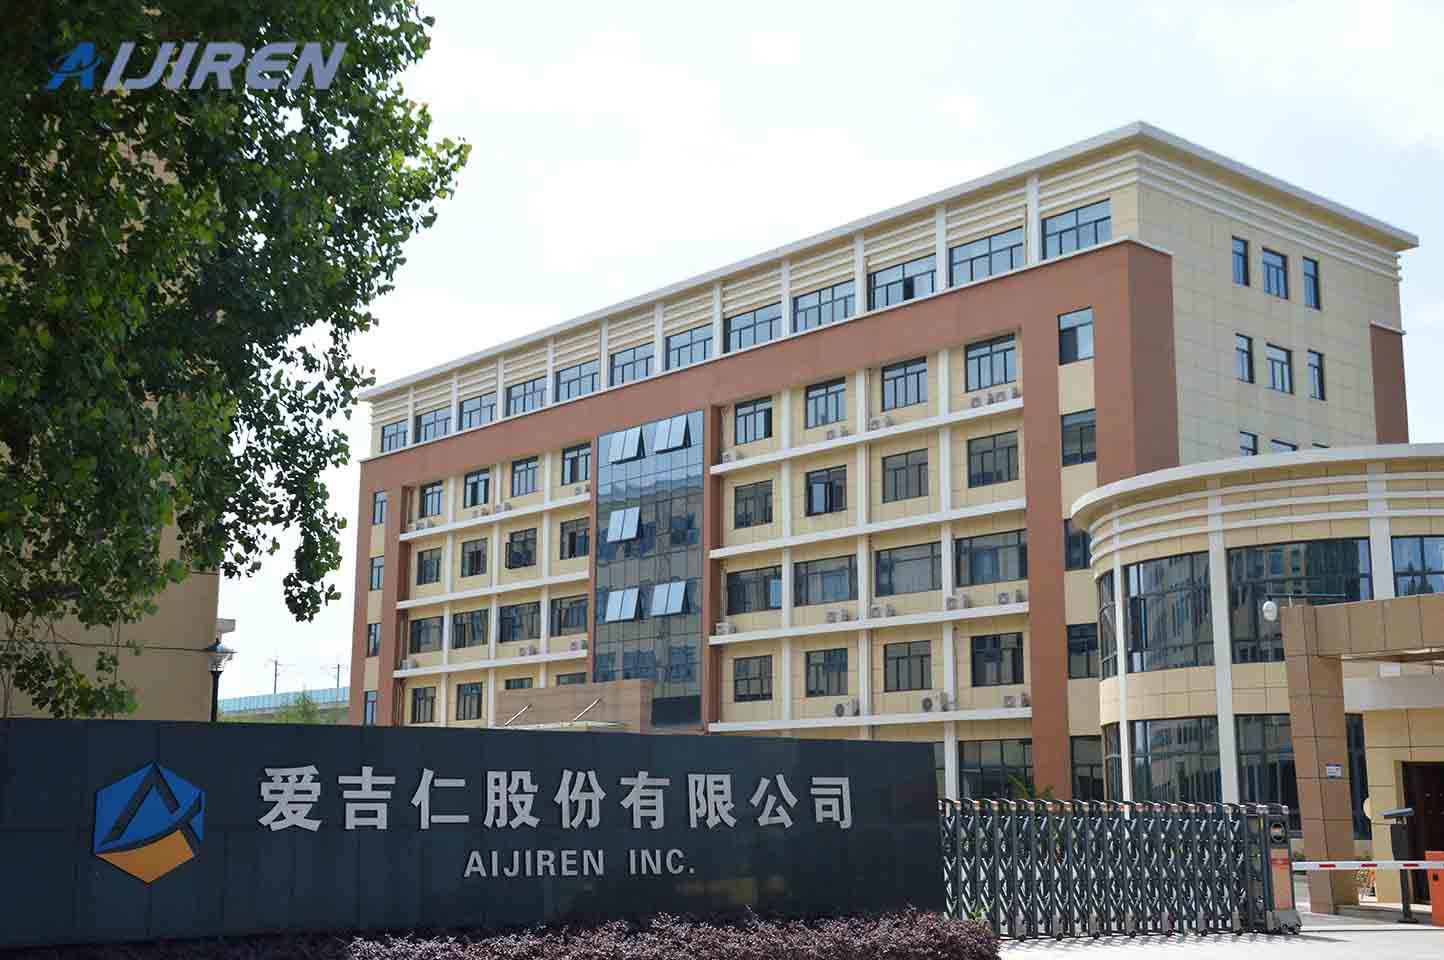 20ml headspace vialAijiren's Office Building